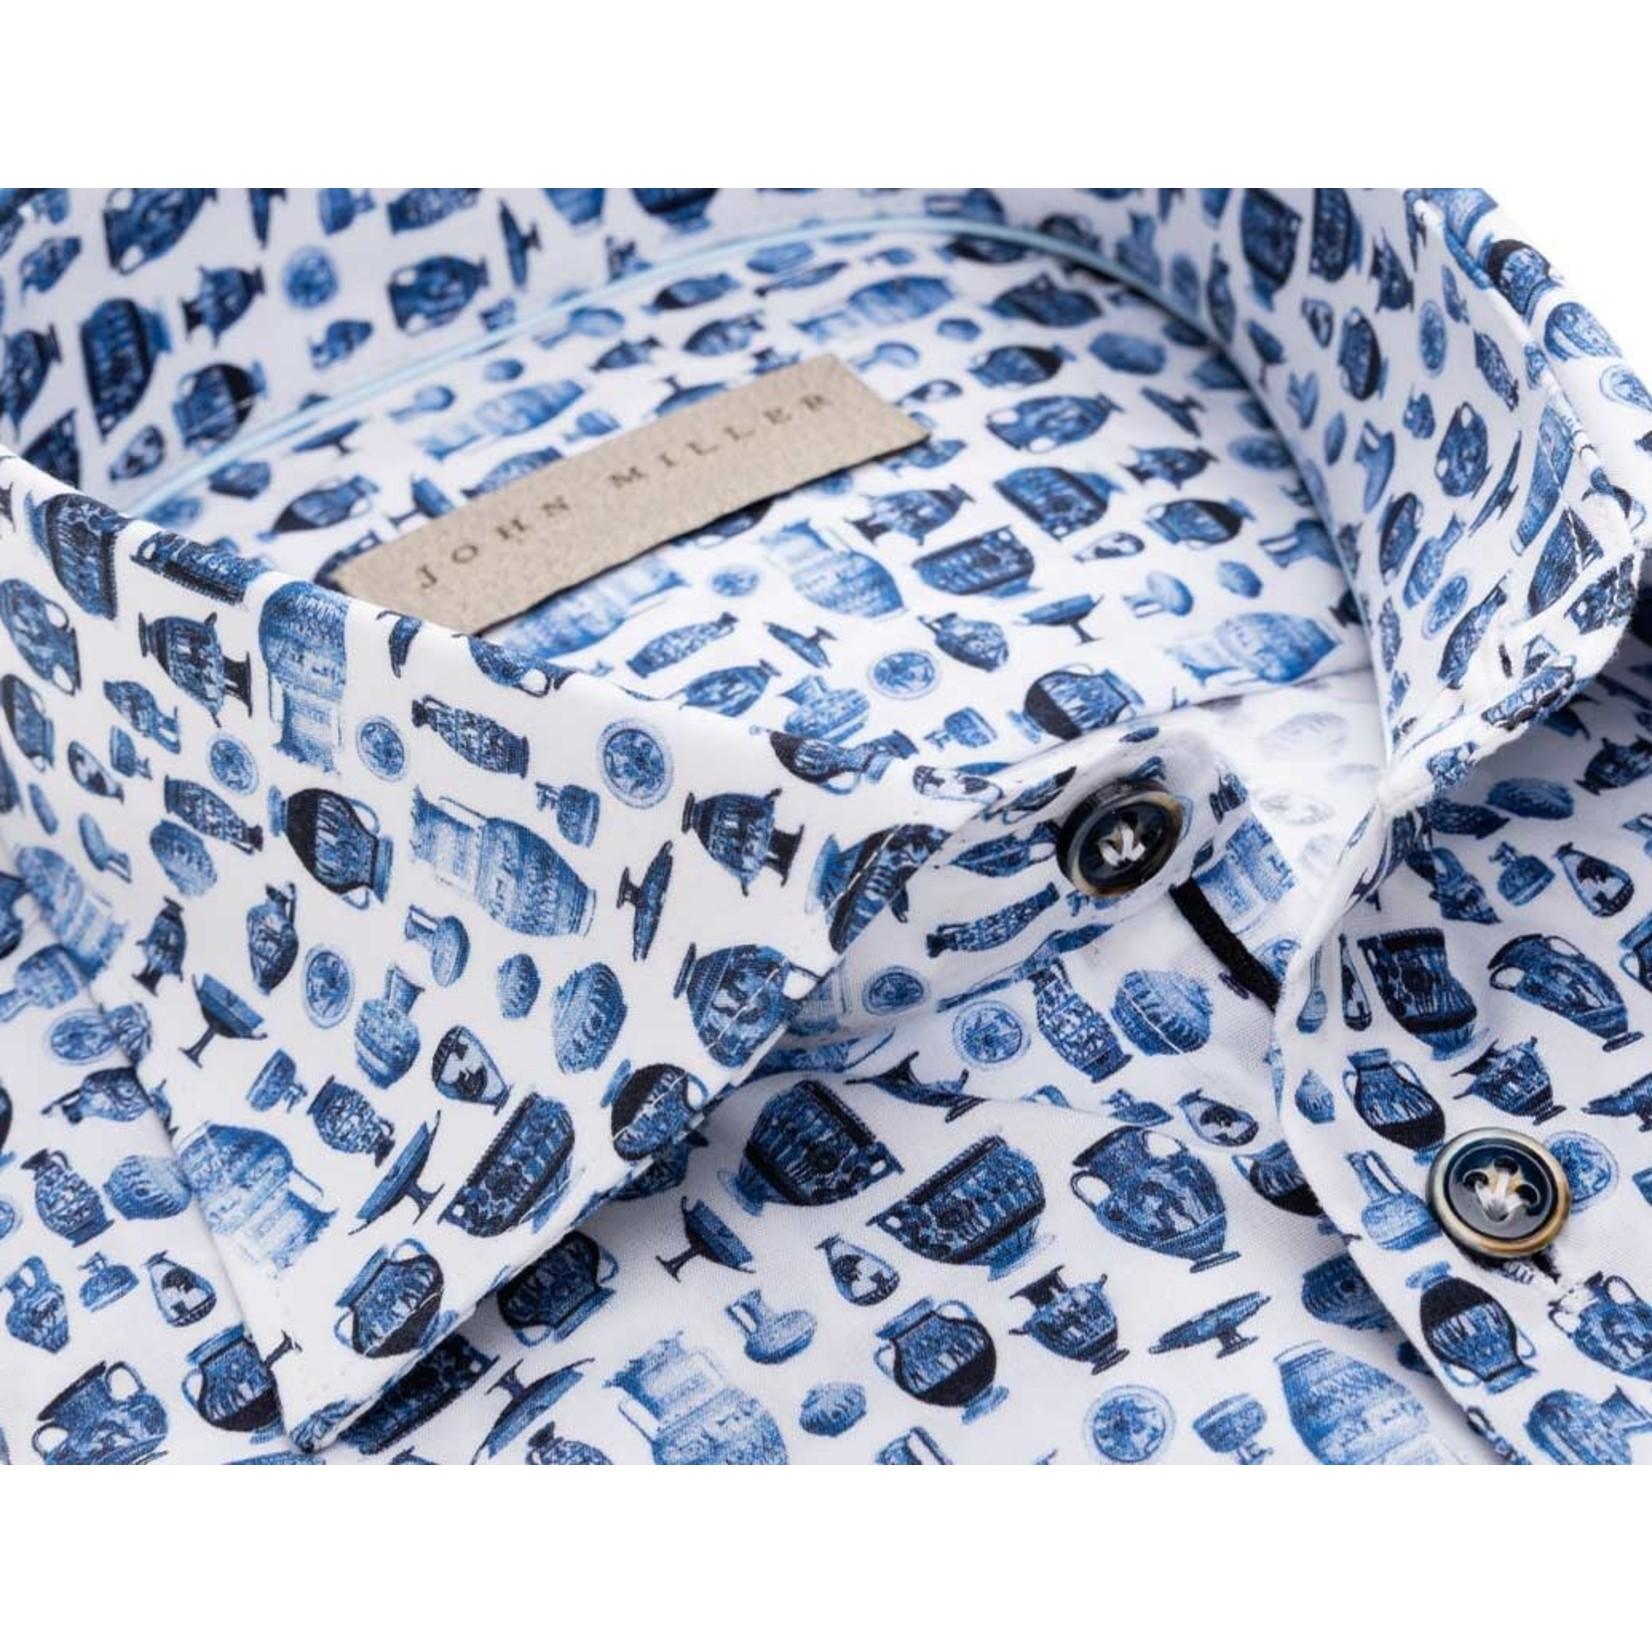 John Miller tailored fit overhemd blauw print met wide spread boord